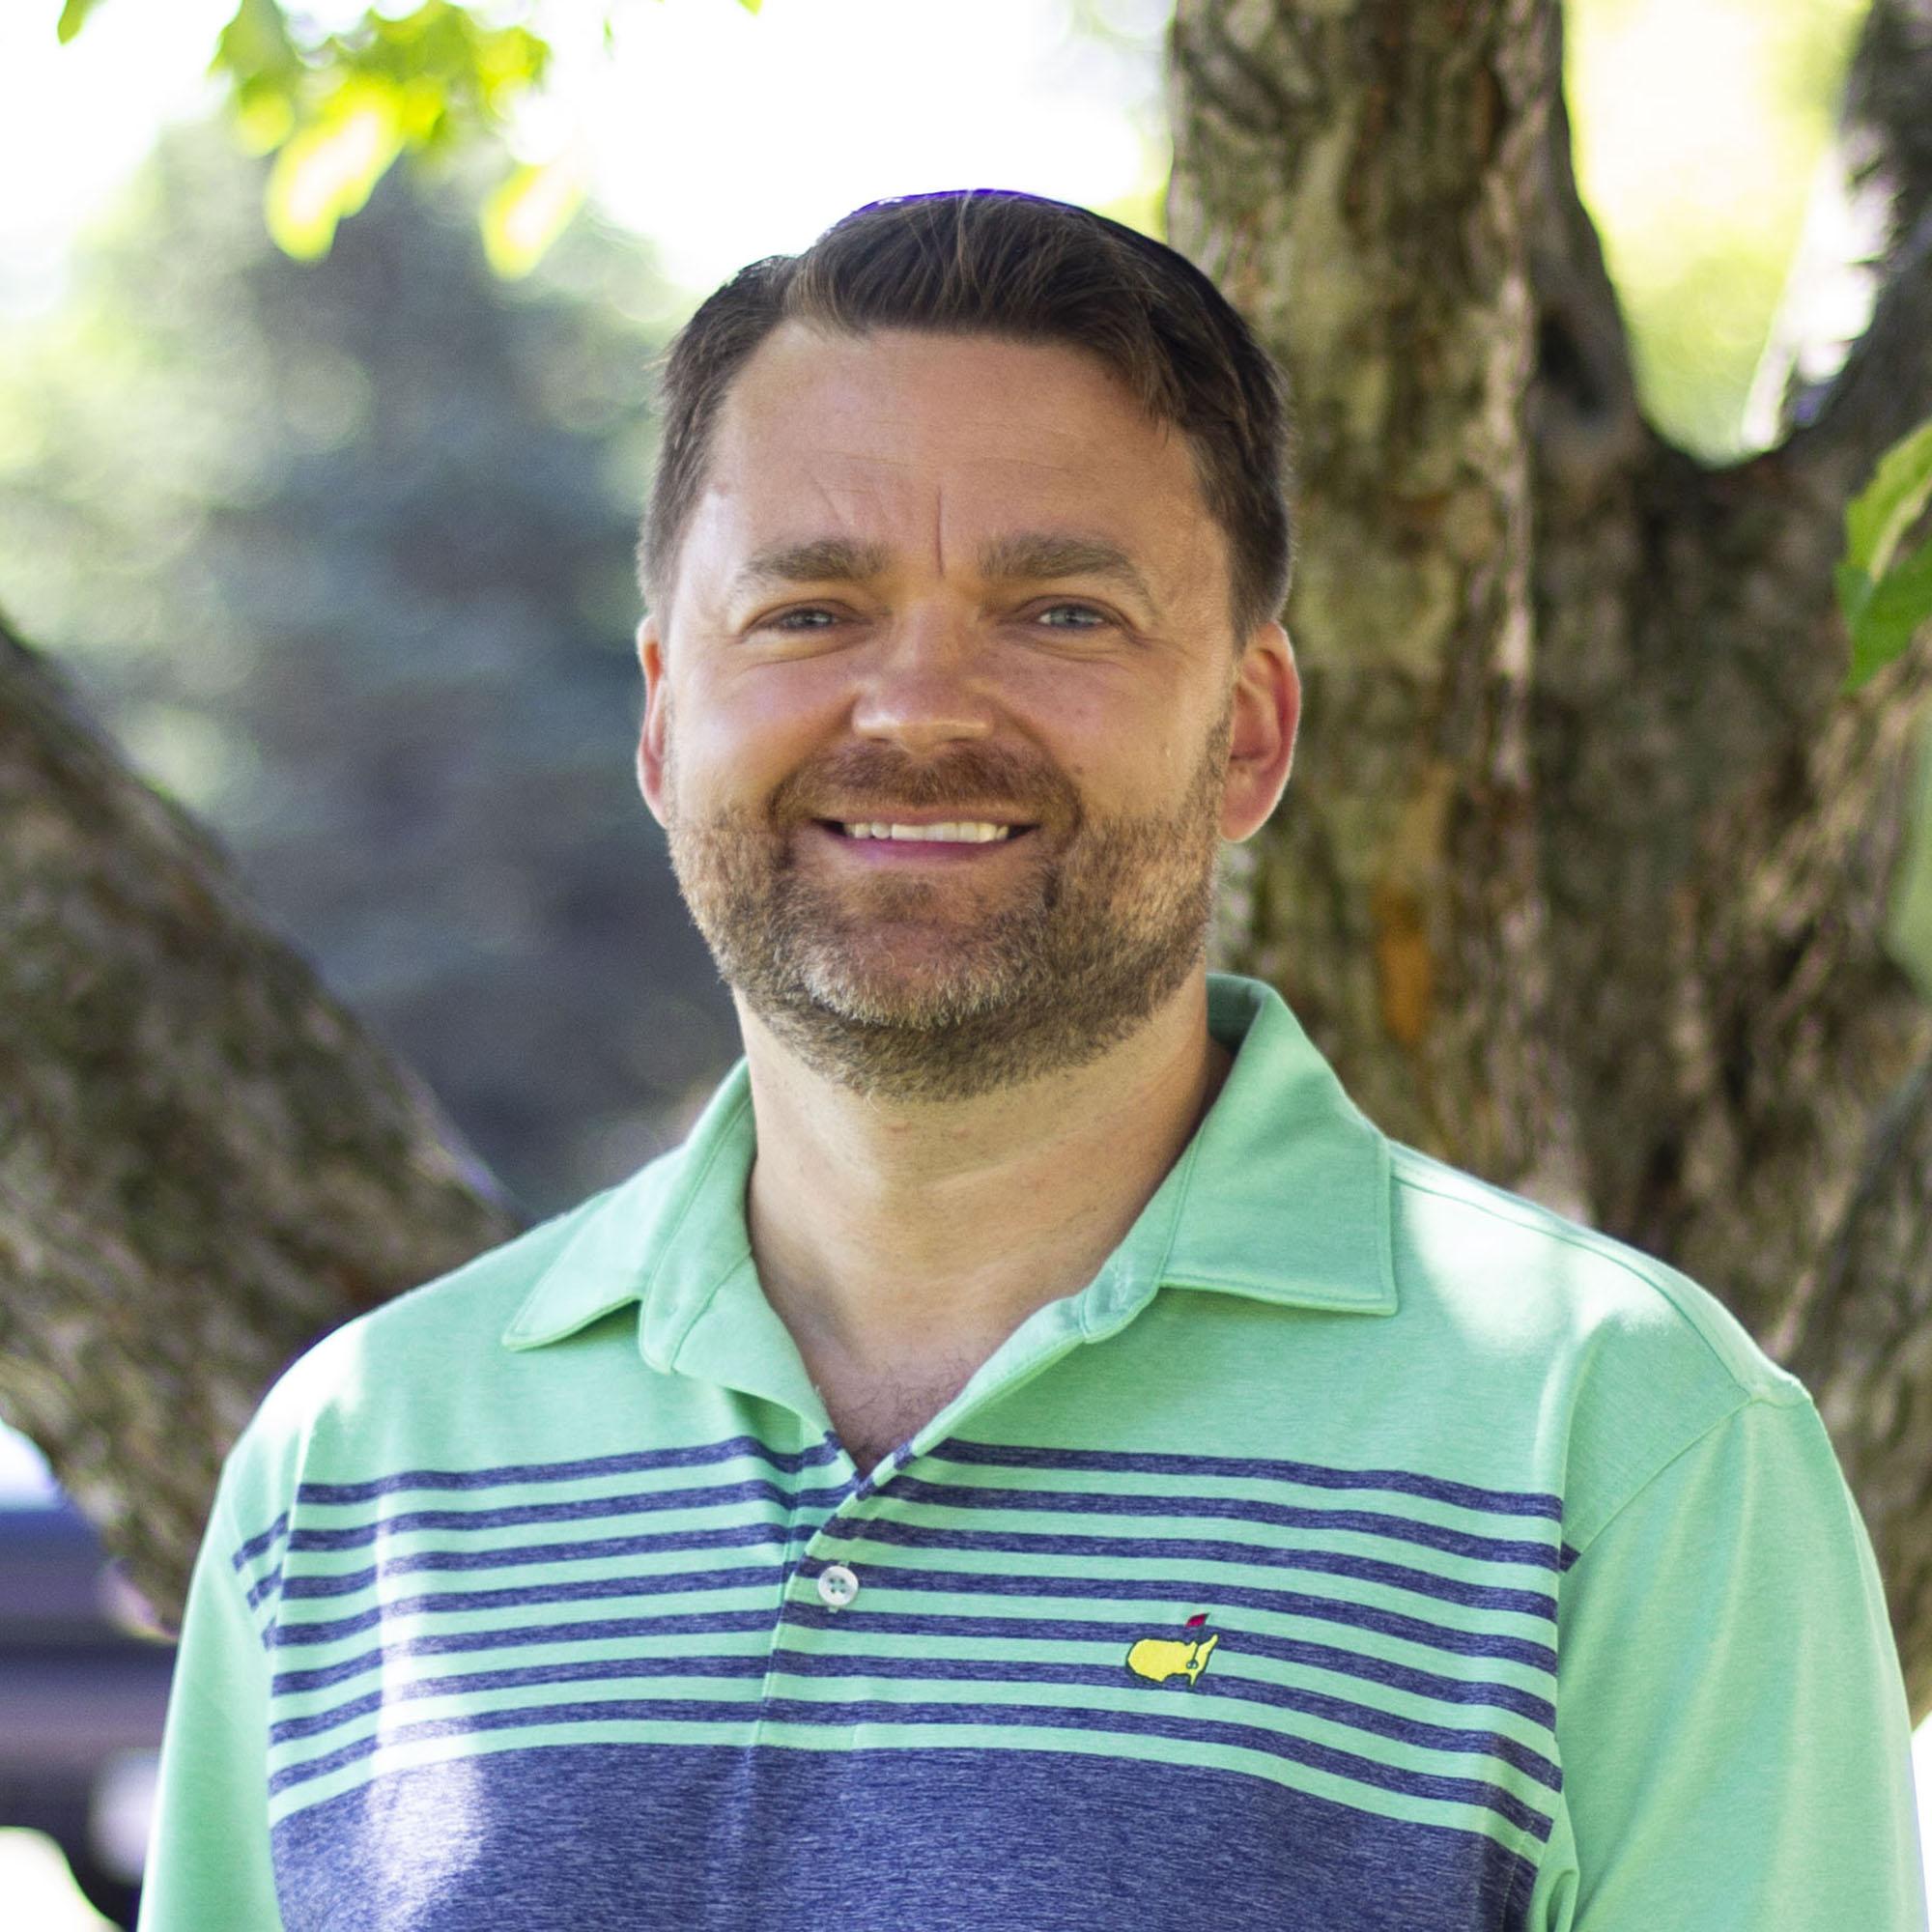 Eric Berglund